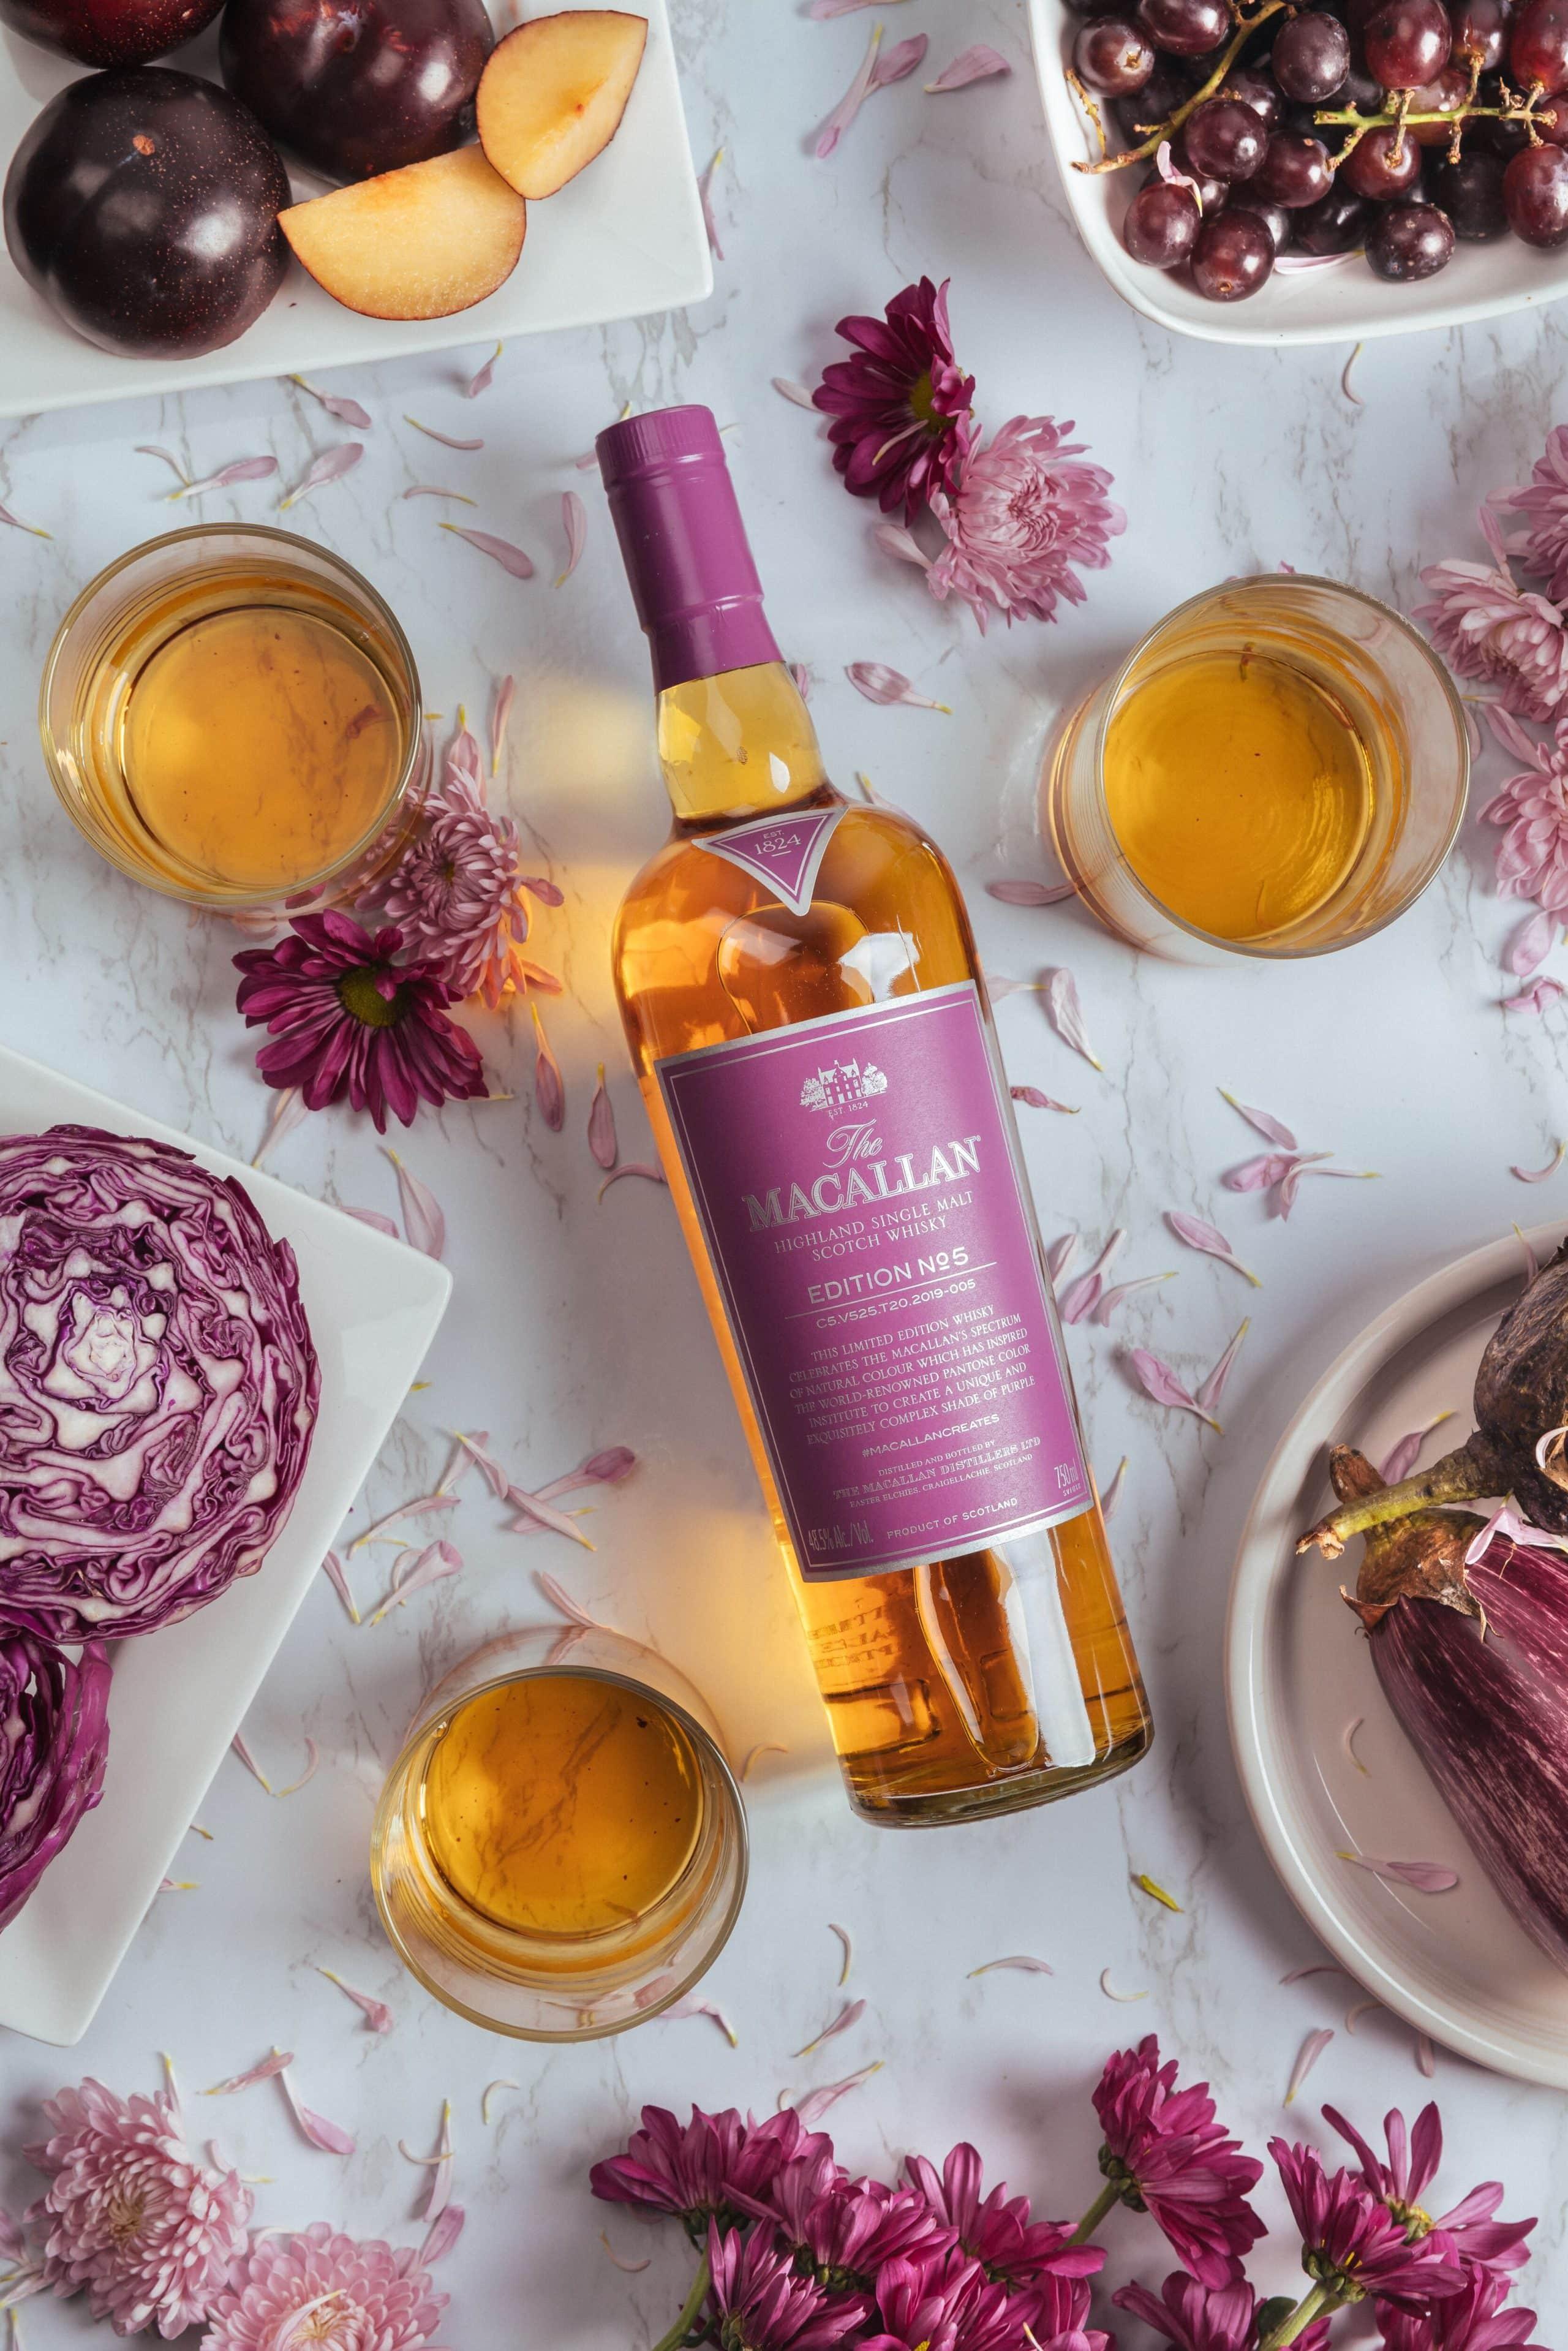 The Macallan edition no.5 ny whisky November 2019